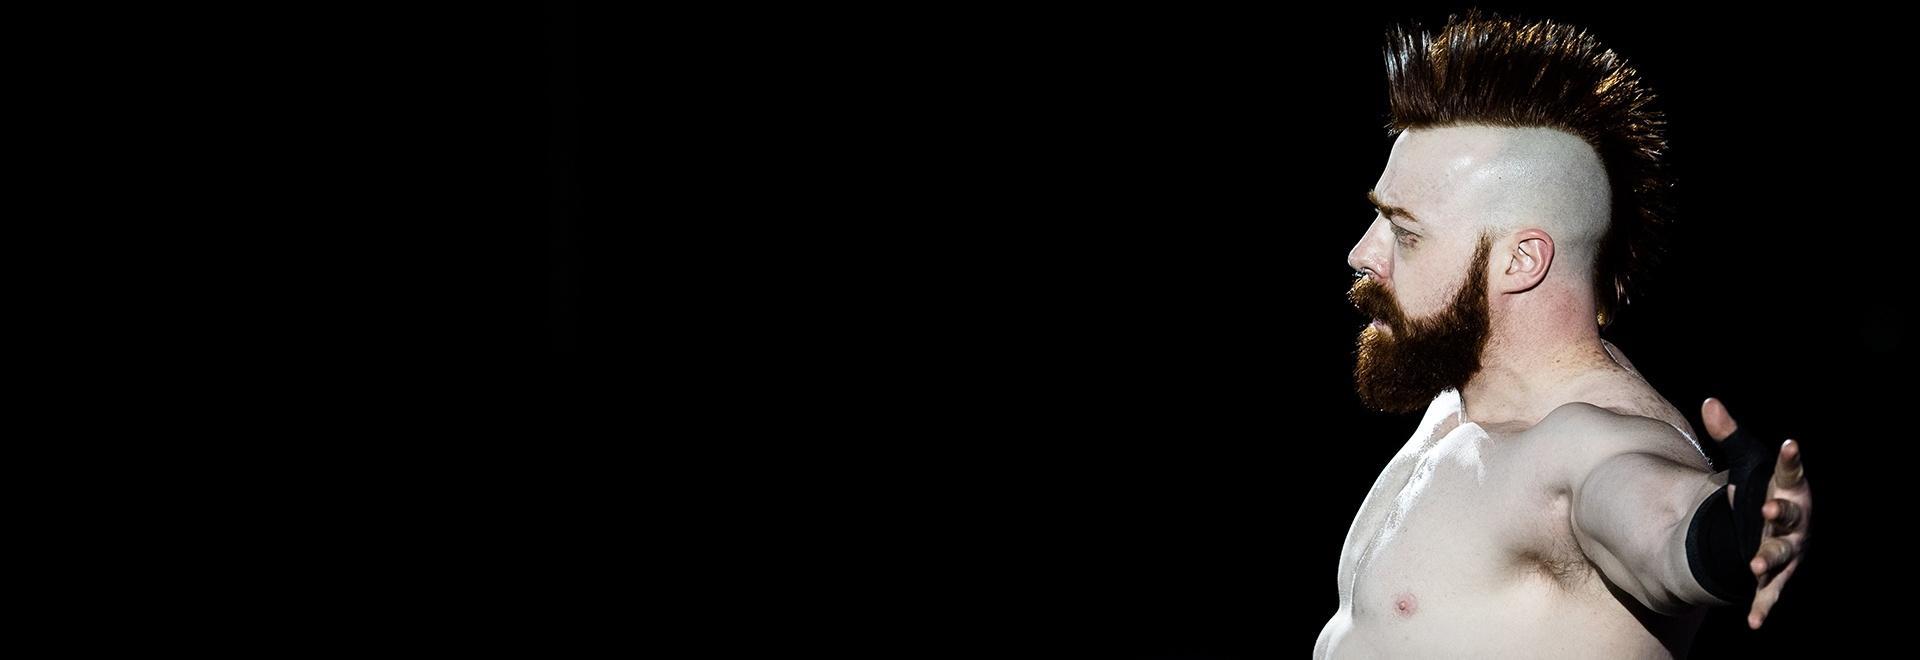 Ep. 229